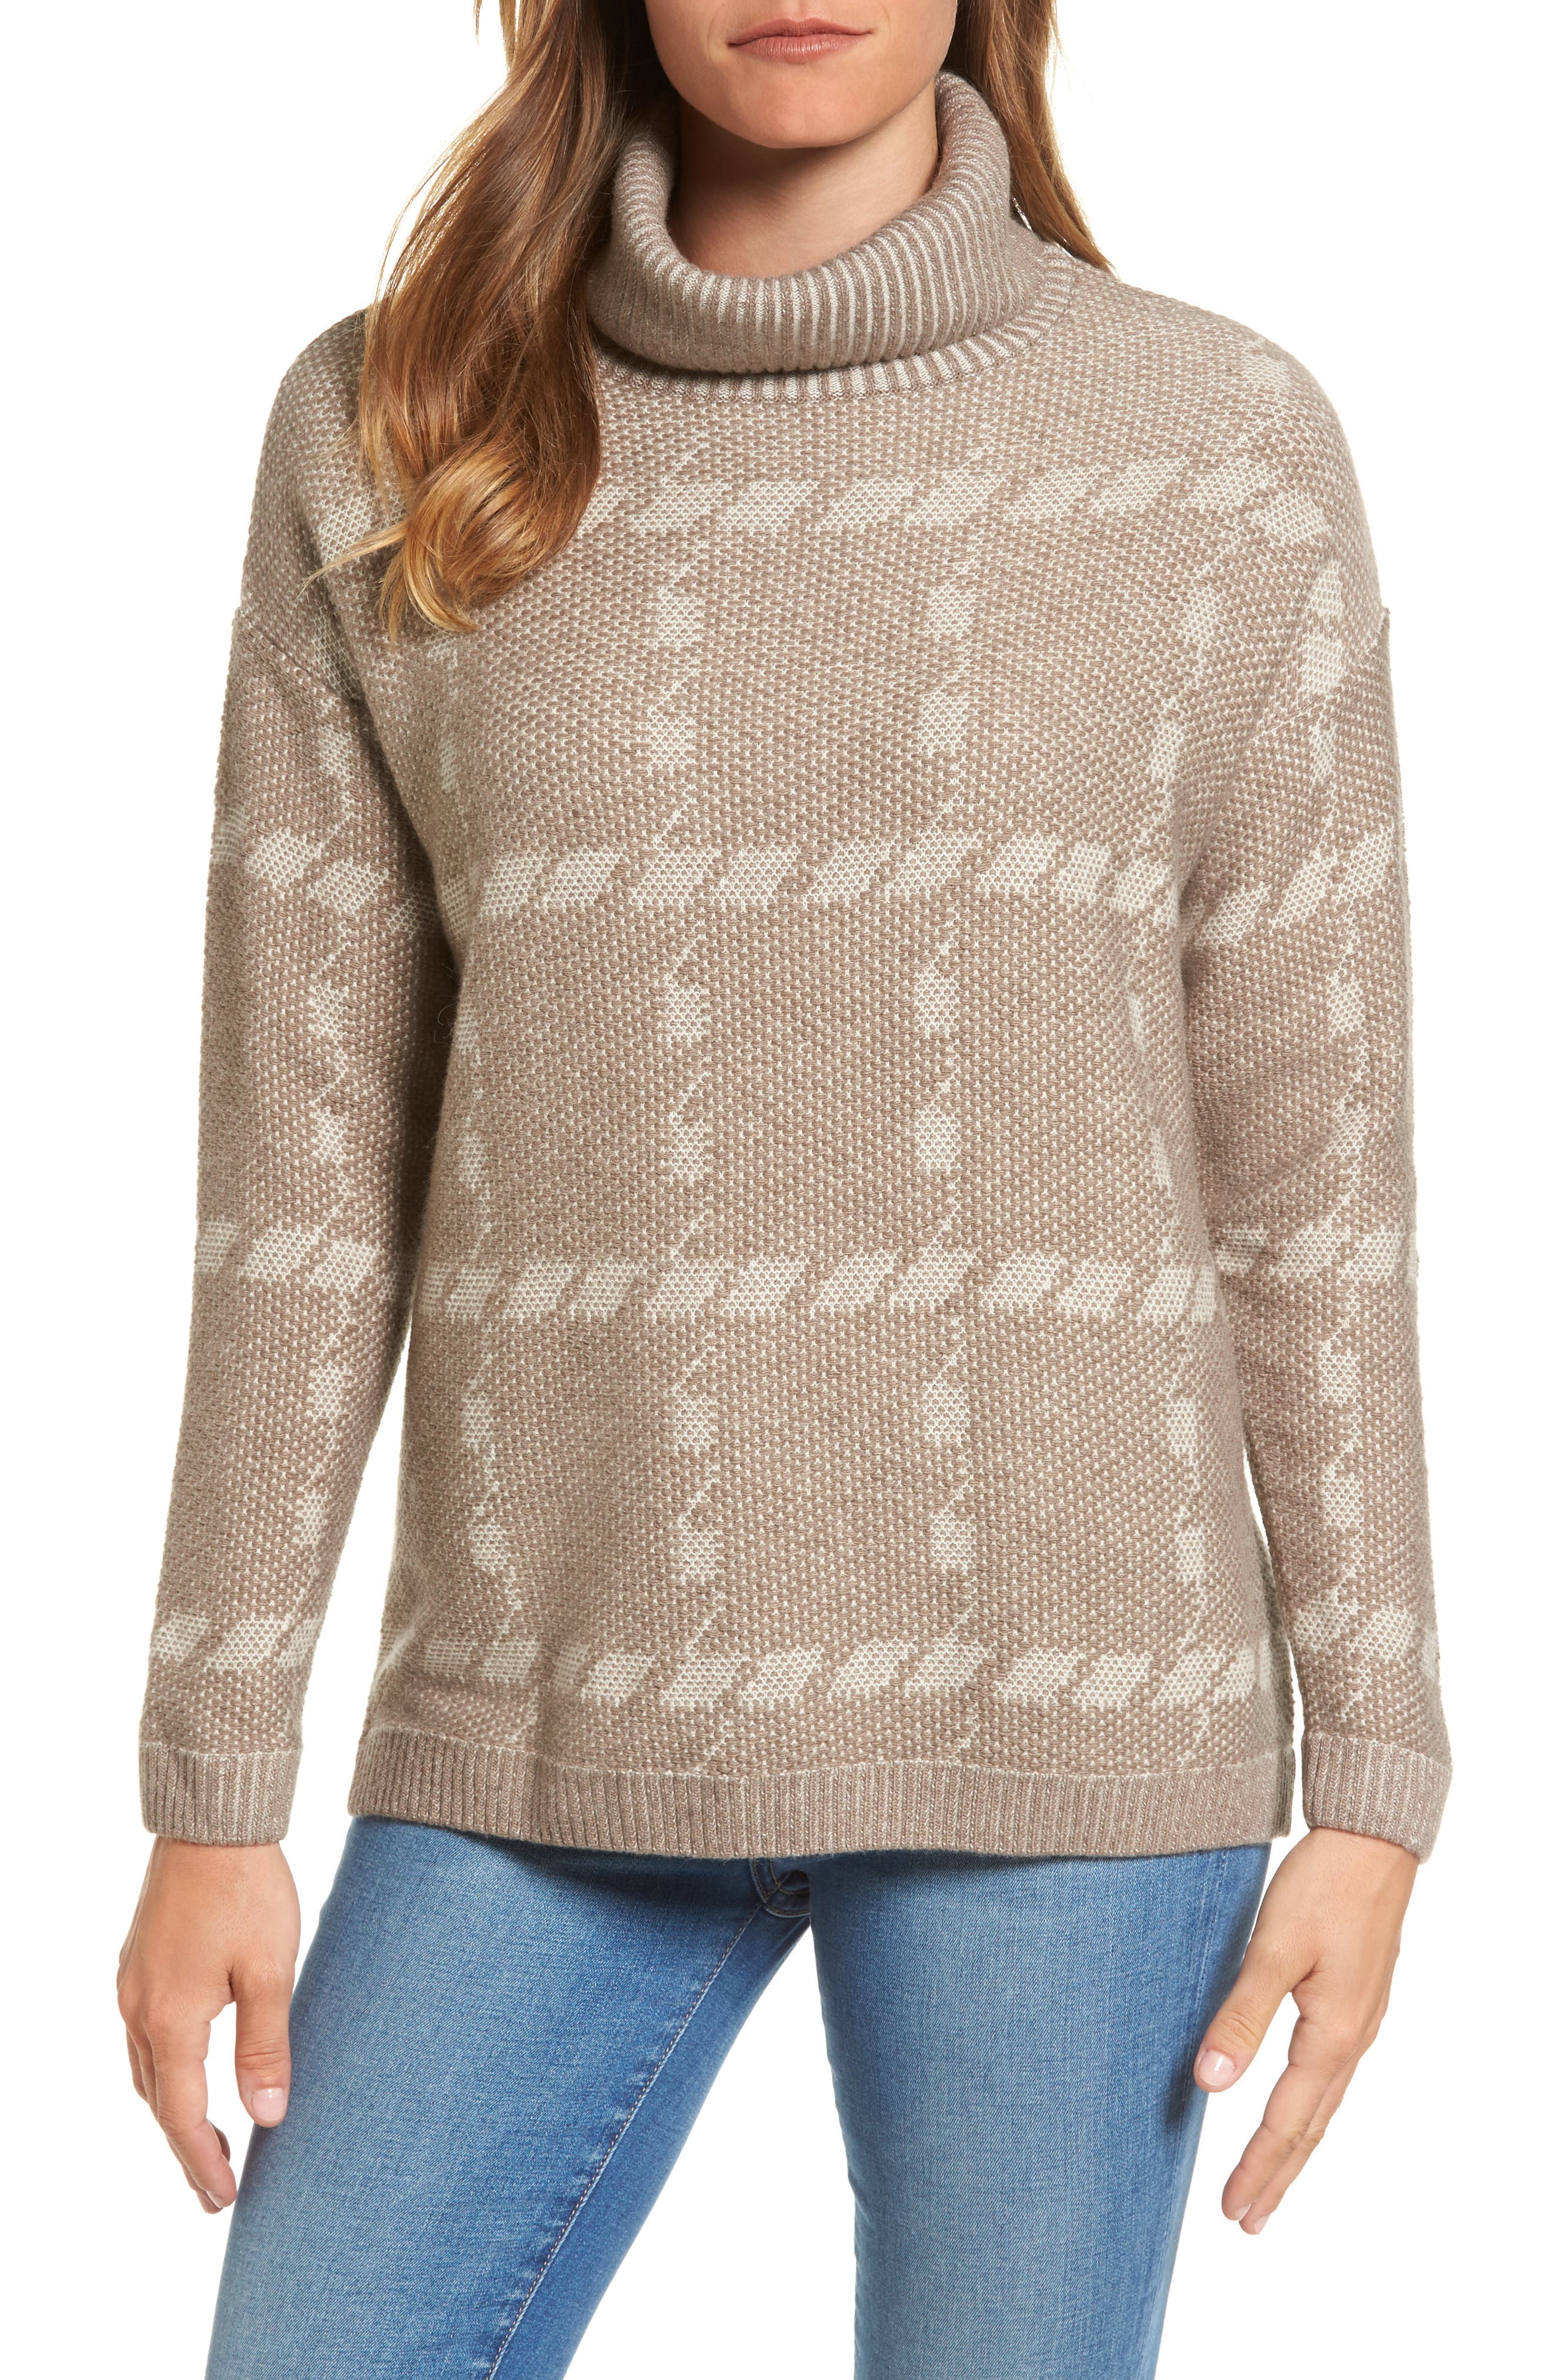 Alternate Image 1 Selected - Barbour Glen Knit Merino Wool Blend Turtleneck Sweater